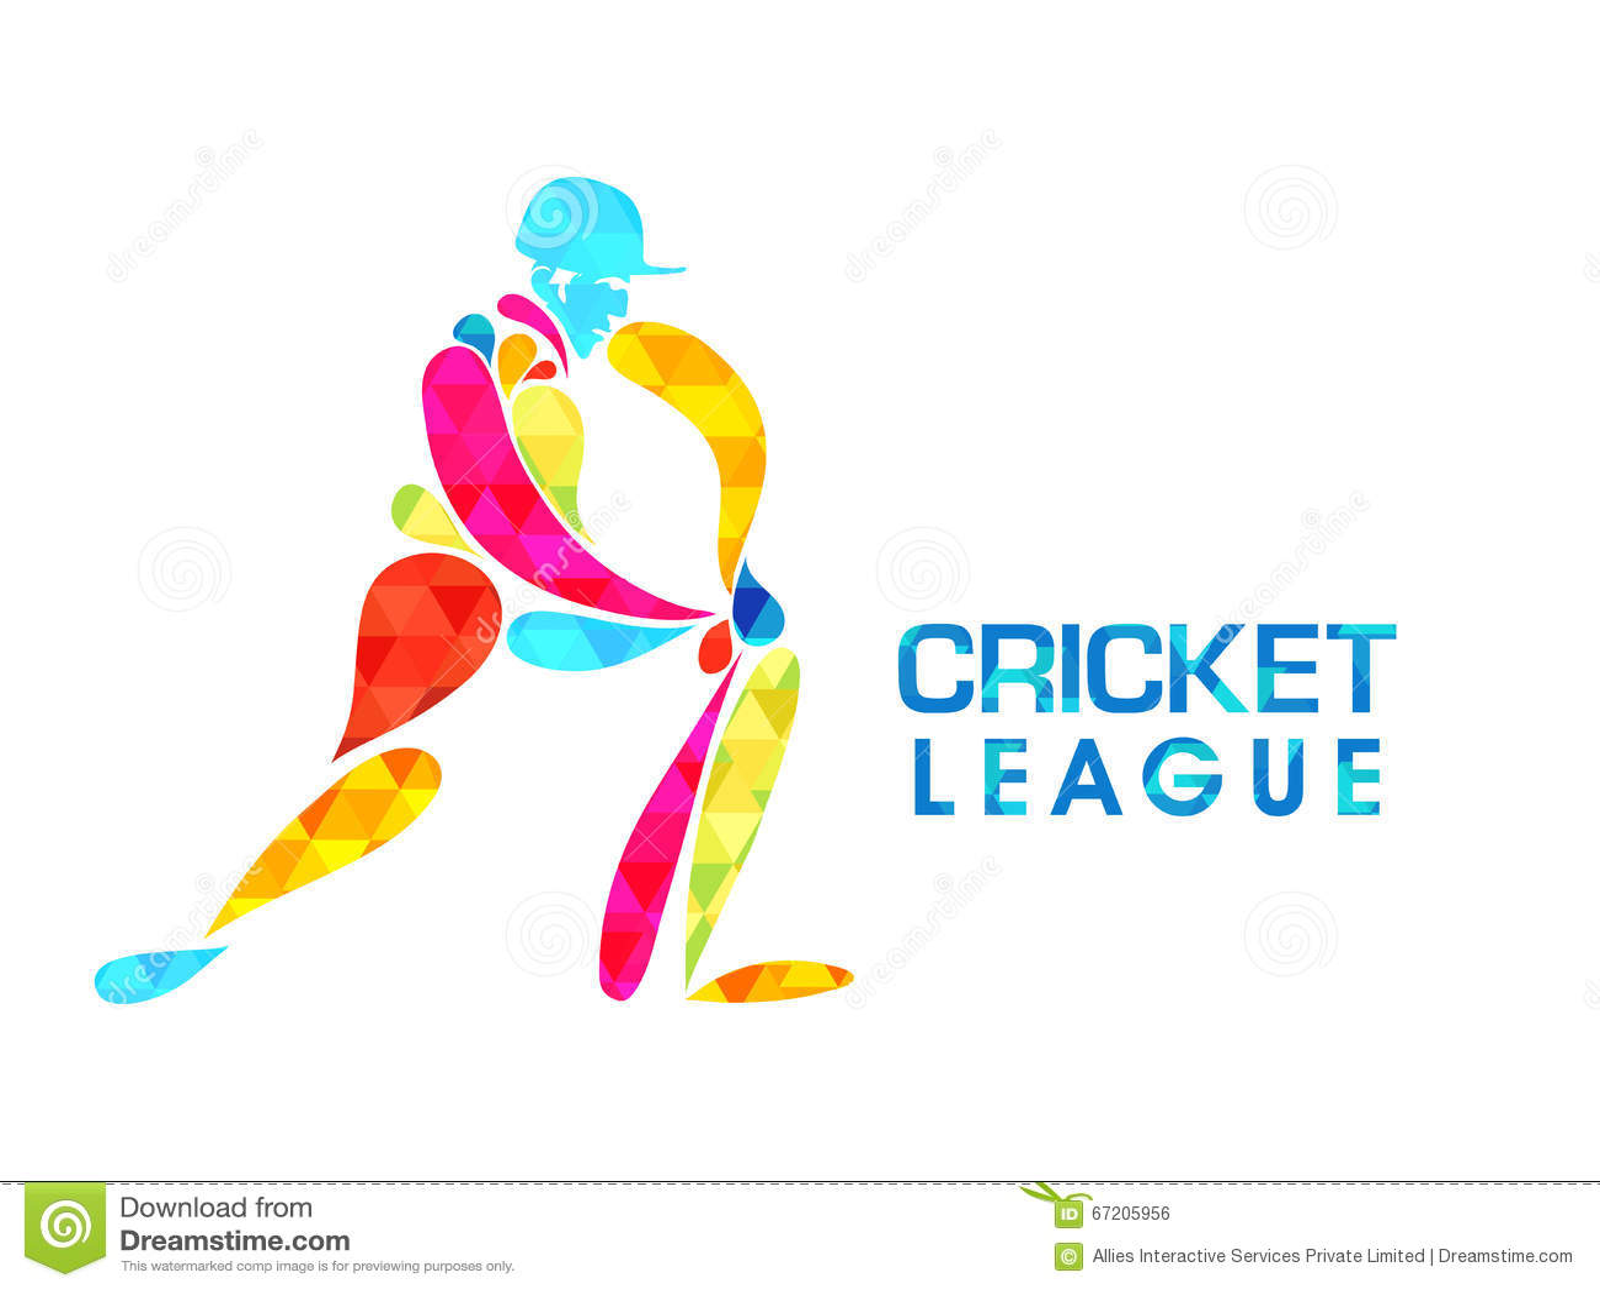 Cricket Vector Background Stock Image: Cricket League Concept With Batsman. Stock Illustration